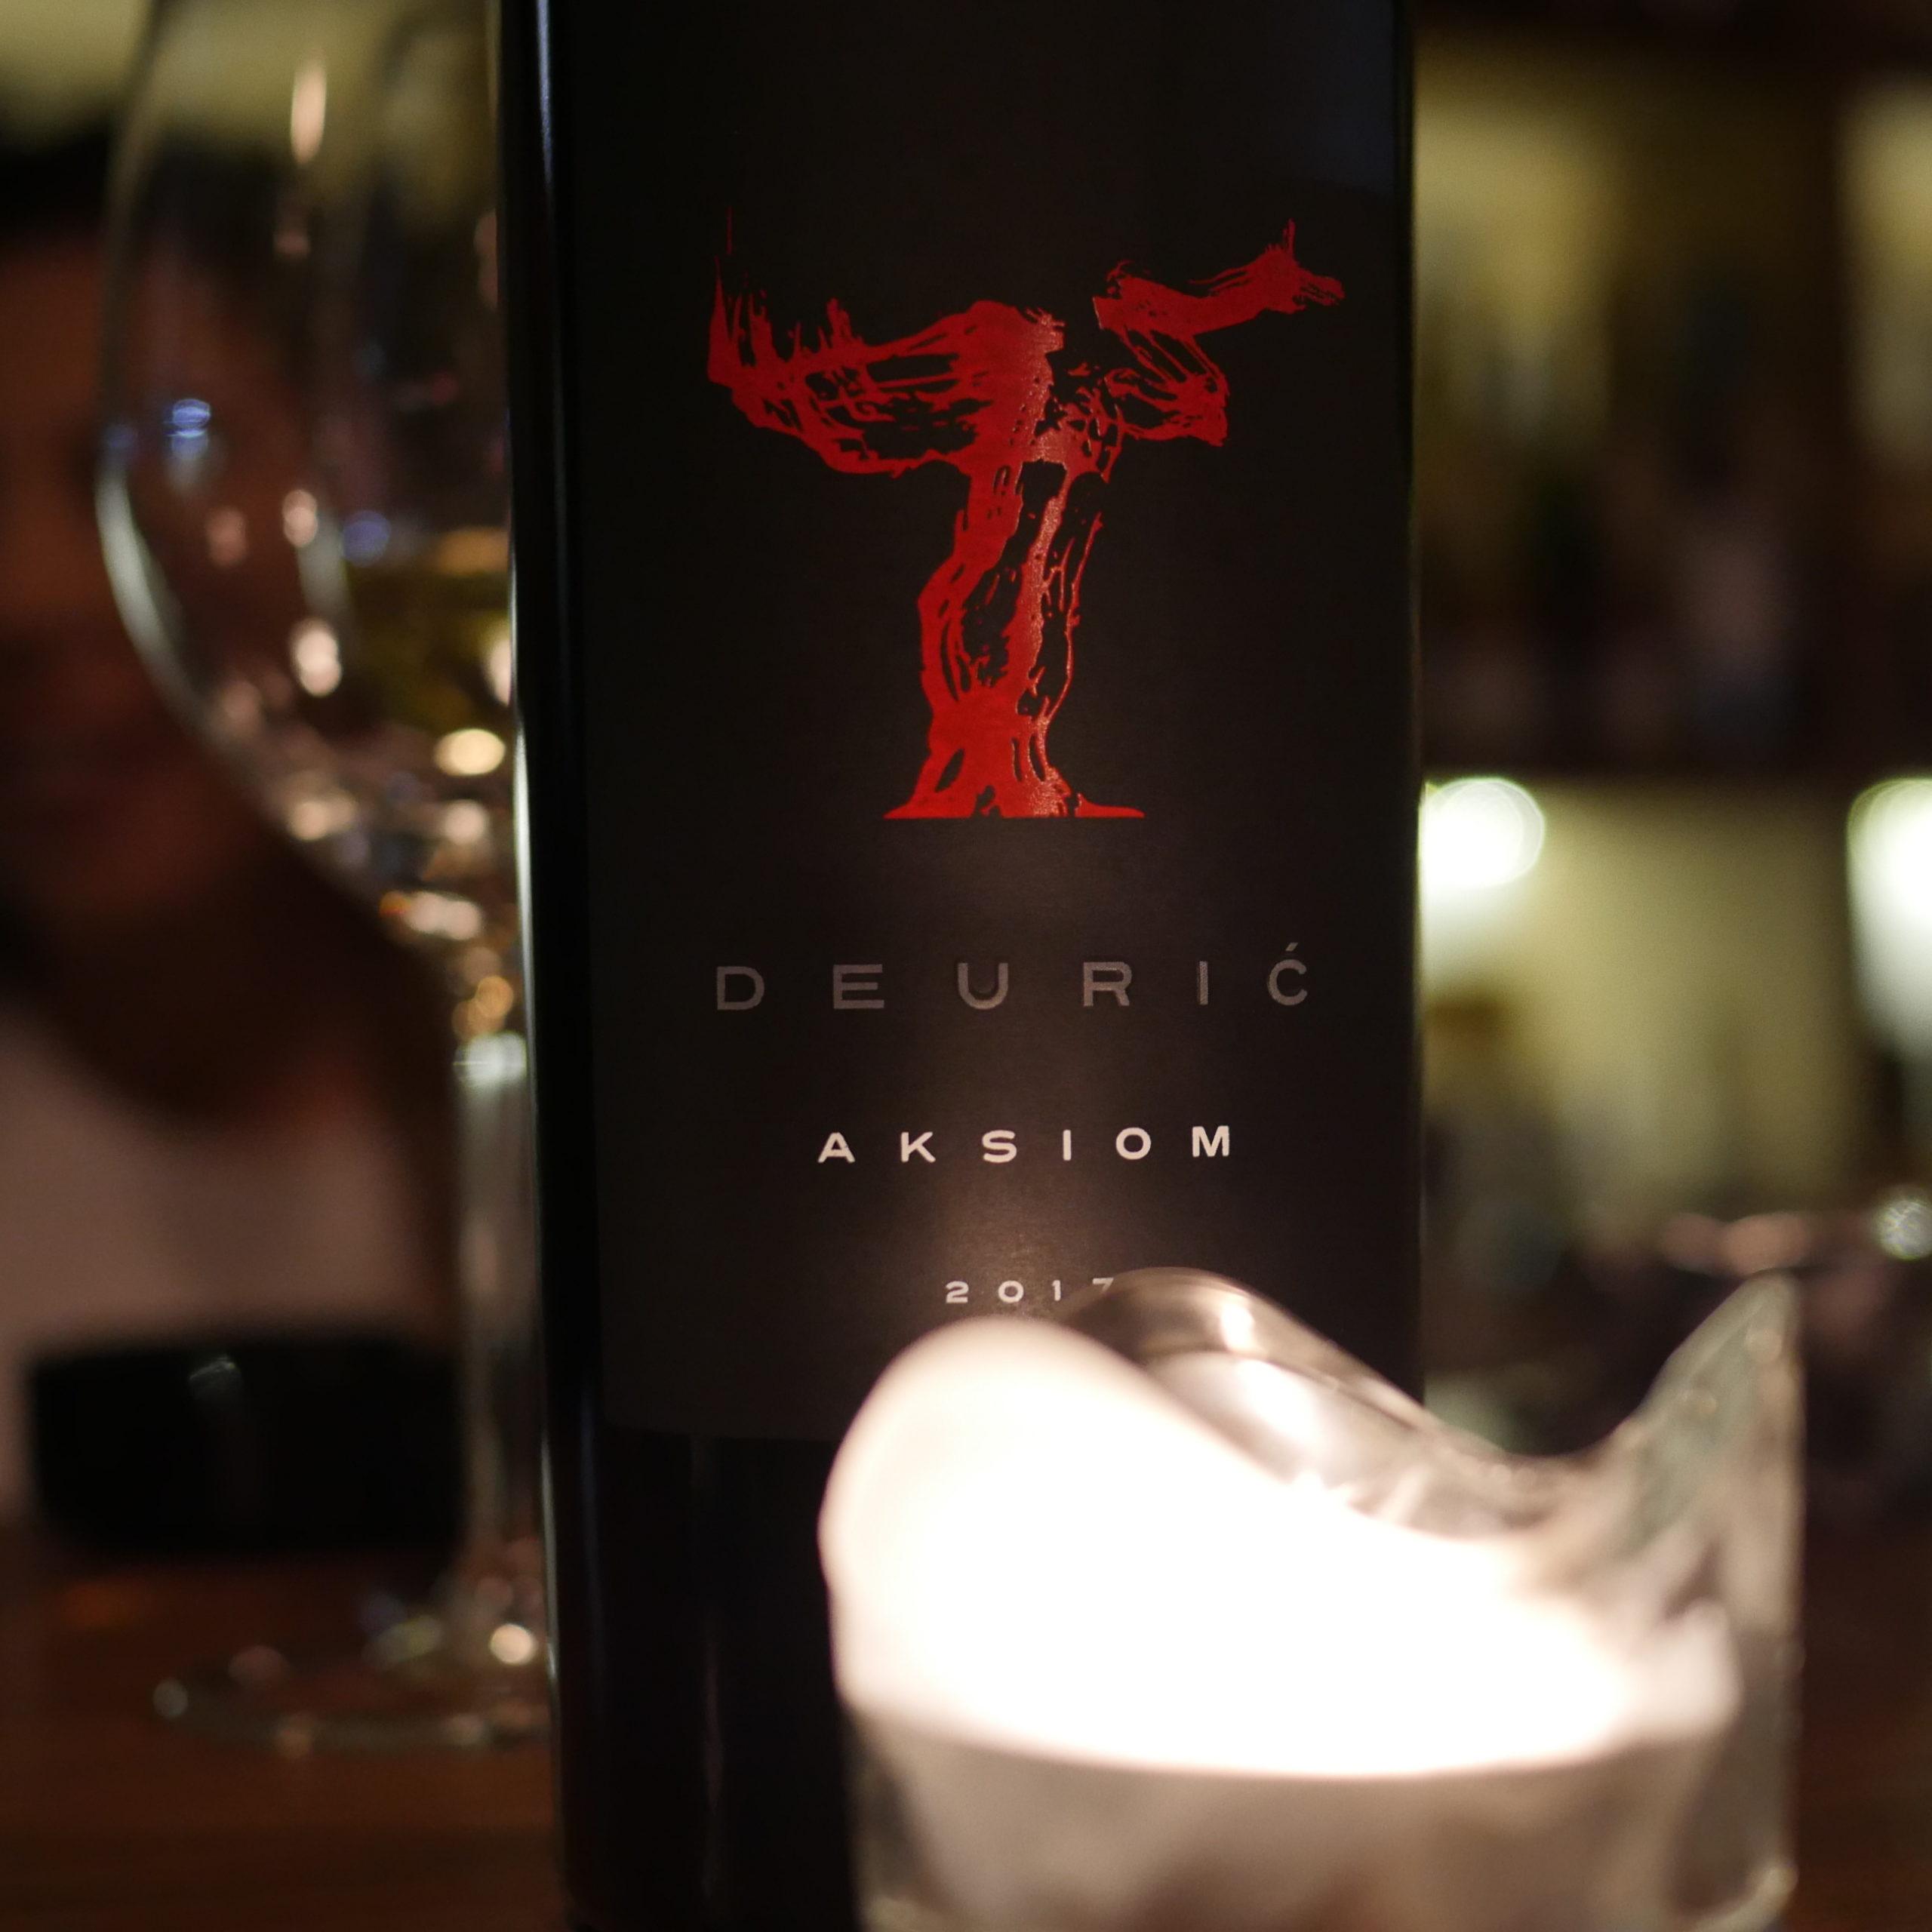 Aksiom - Deurić vinarija